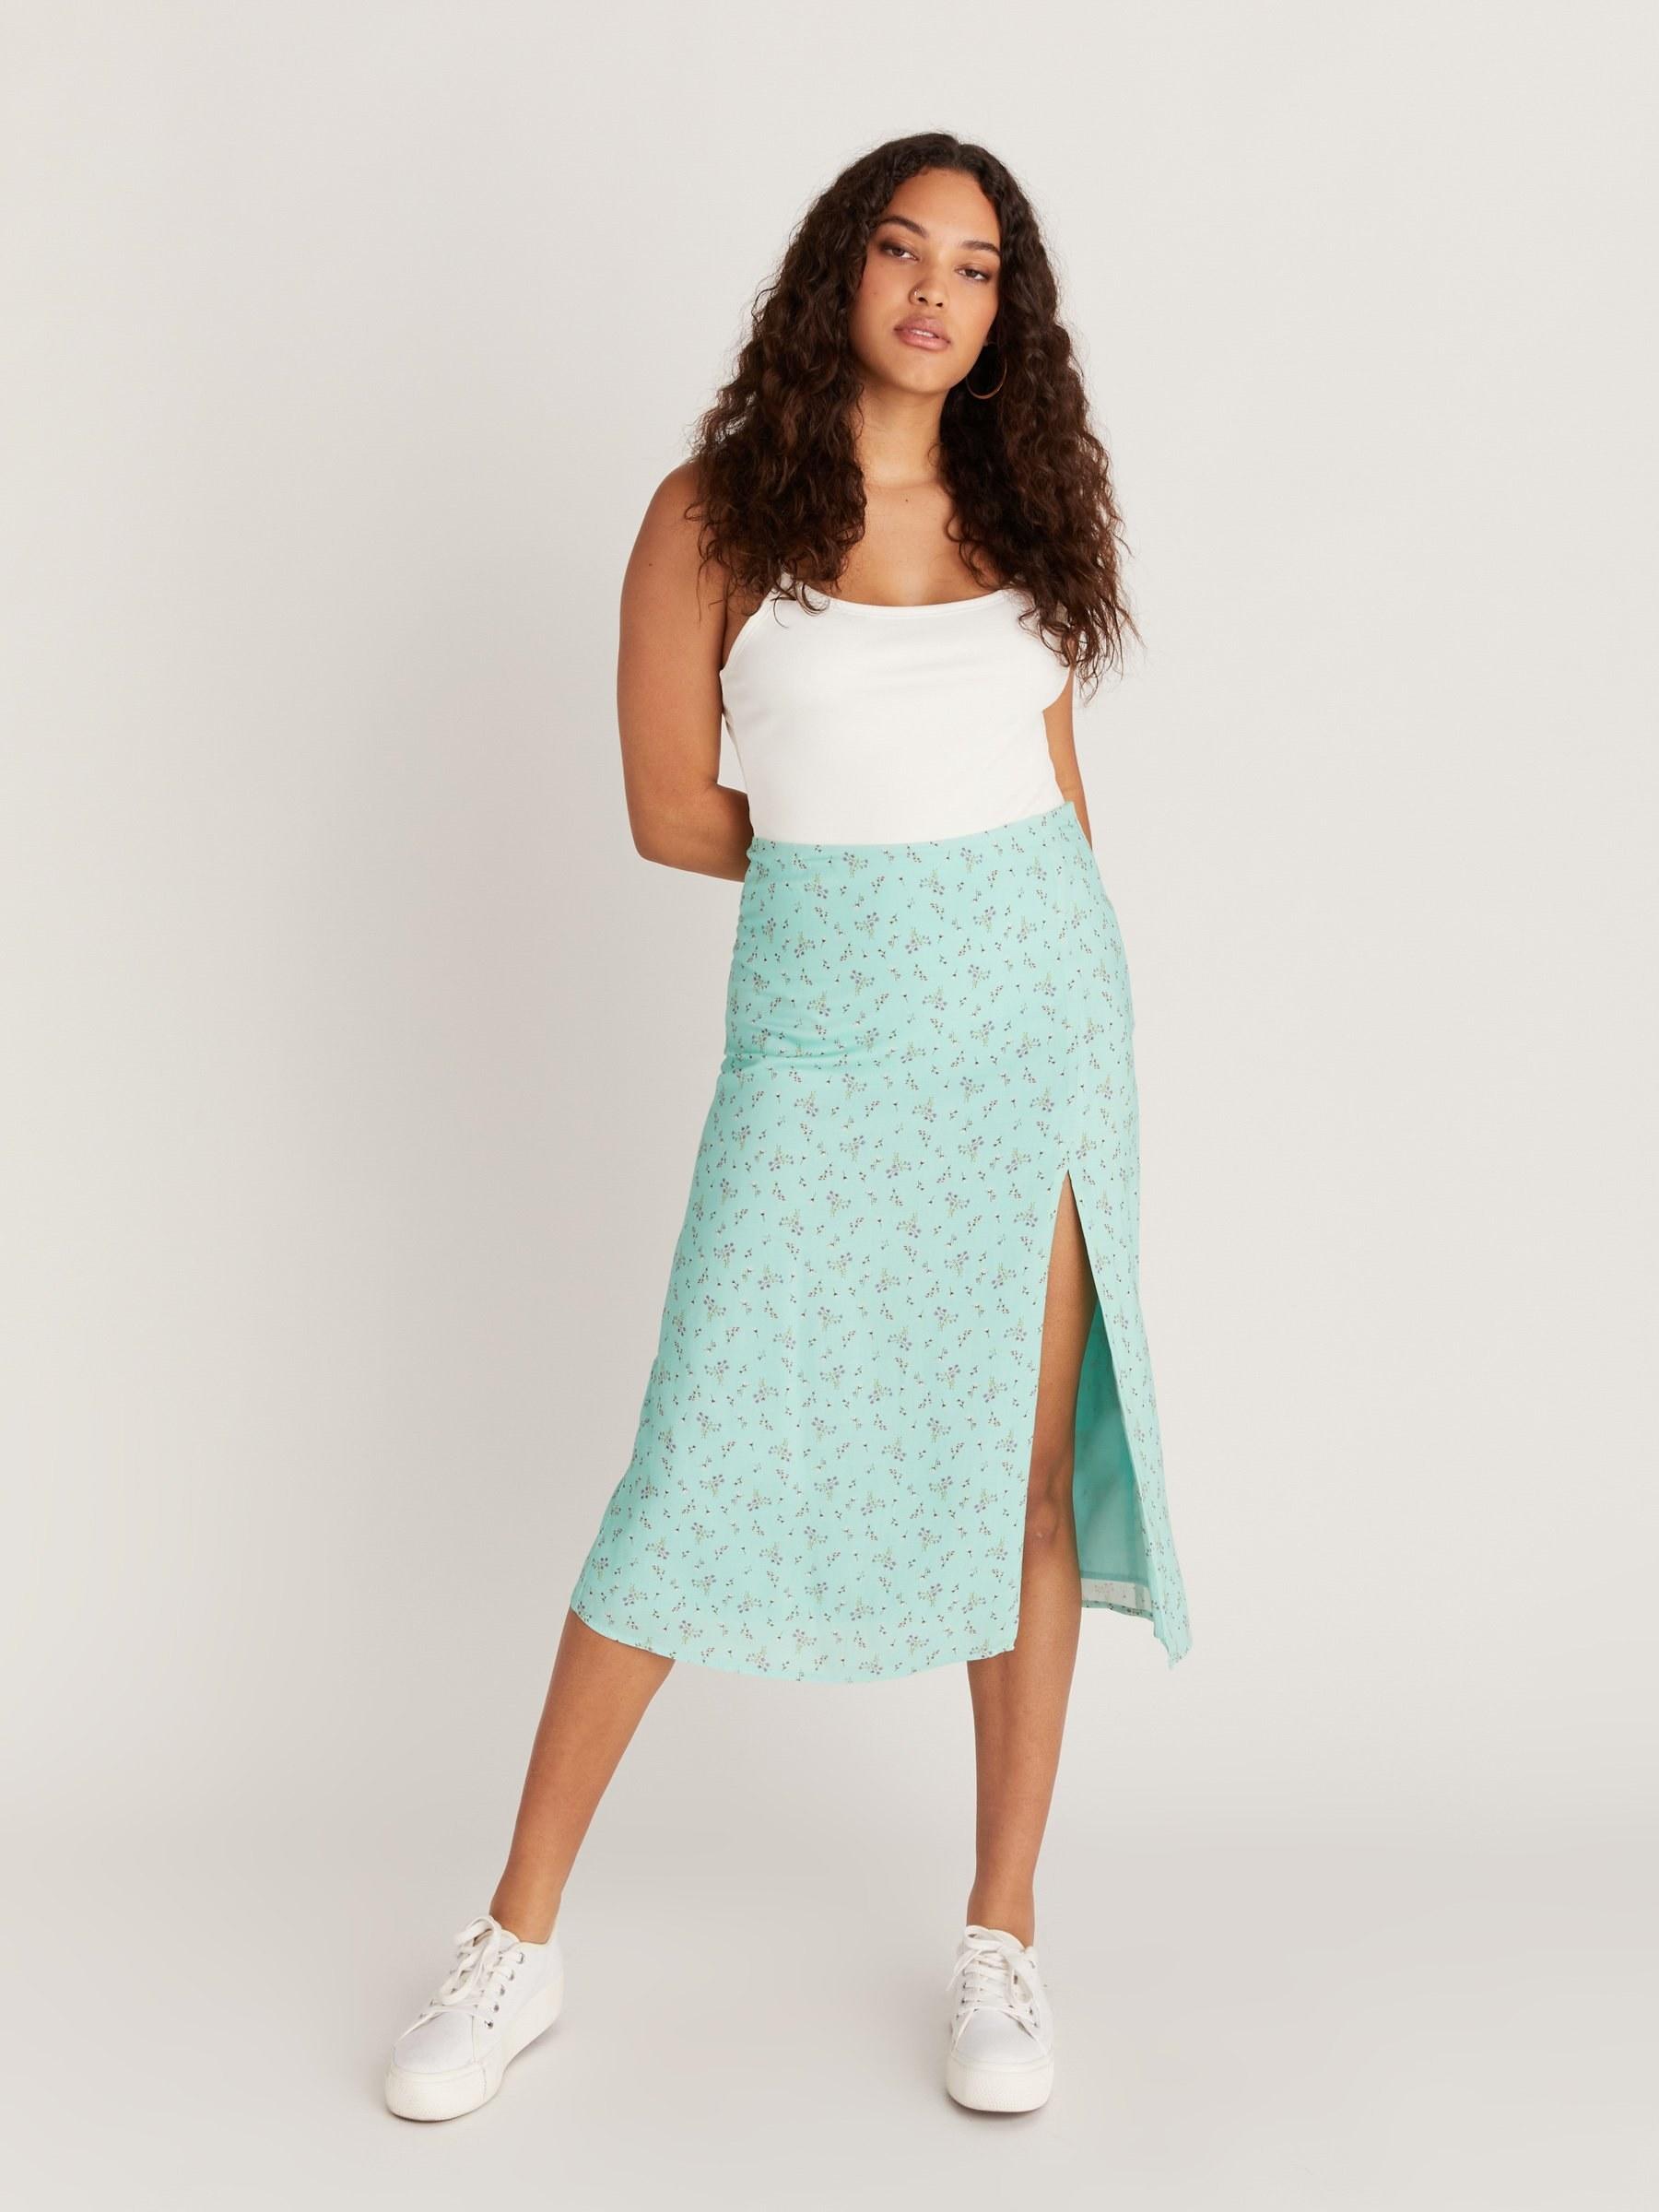 model wearing green floral skirt